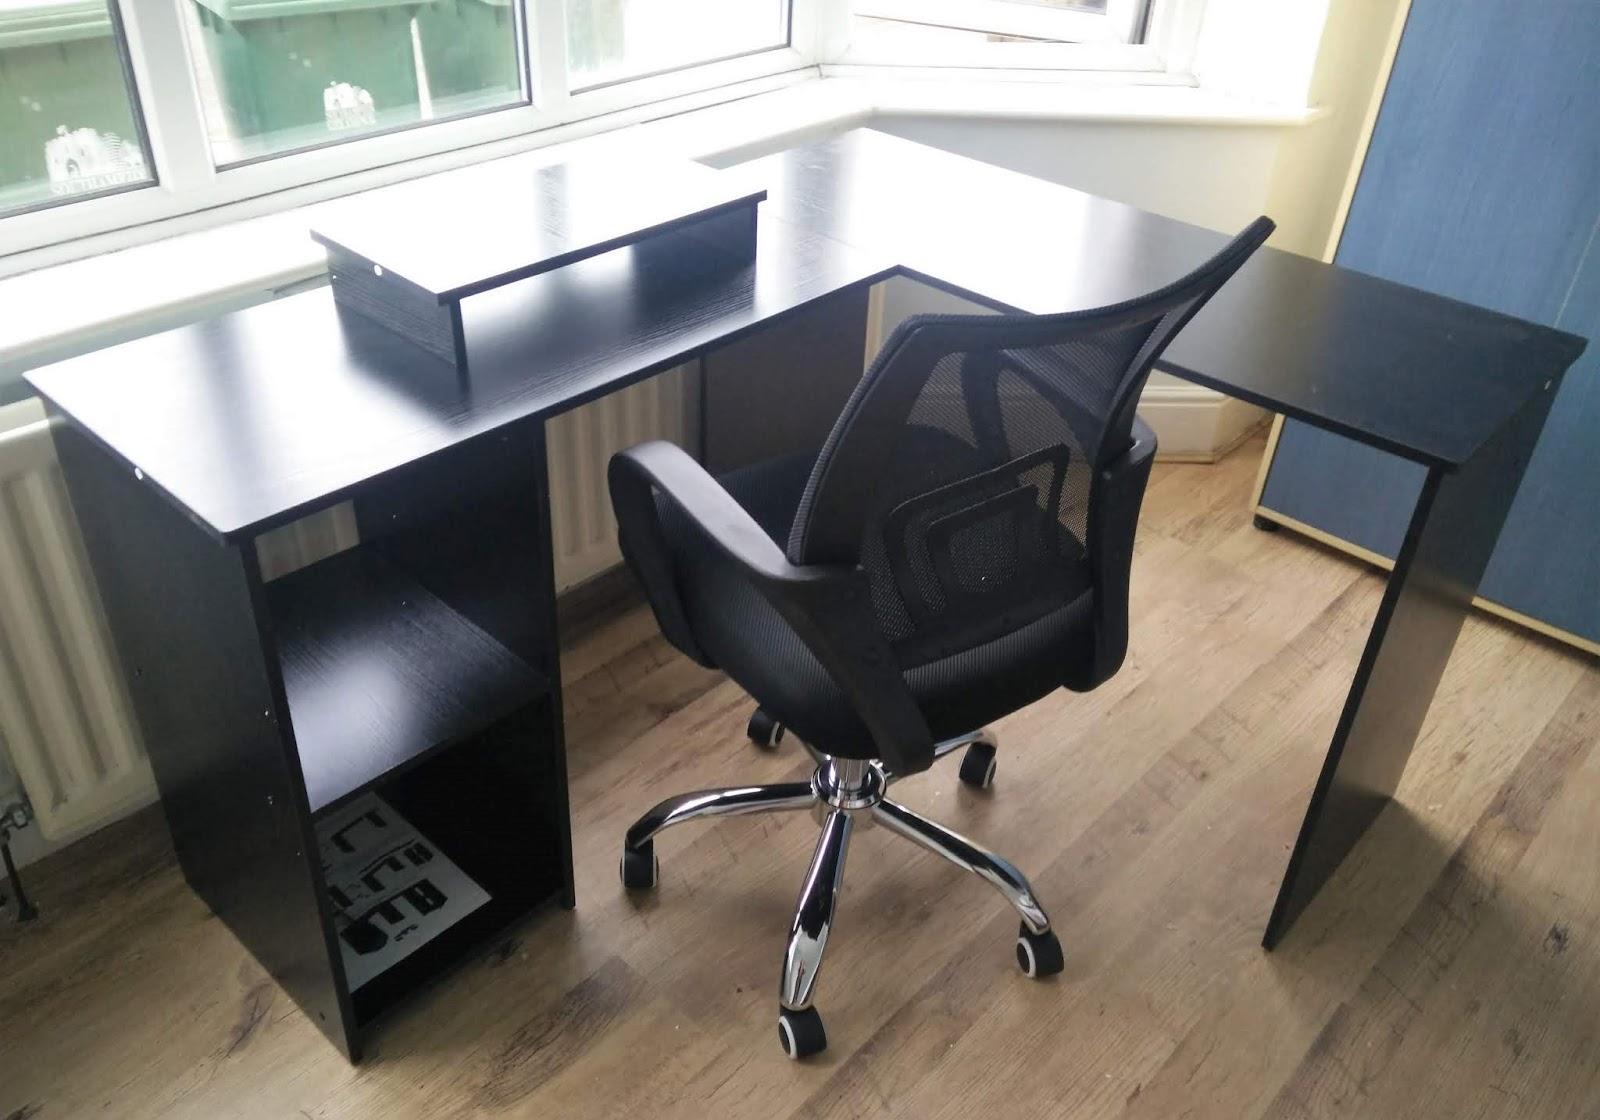 L-Shaped Large Corner PC Laptop Desk Study Table DOSLEEPS Computer Desk